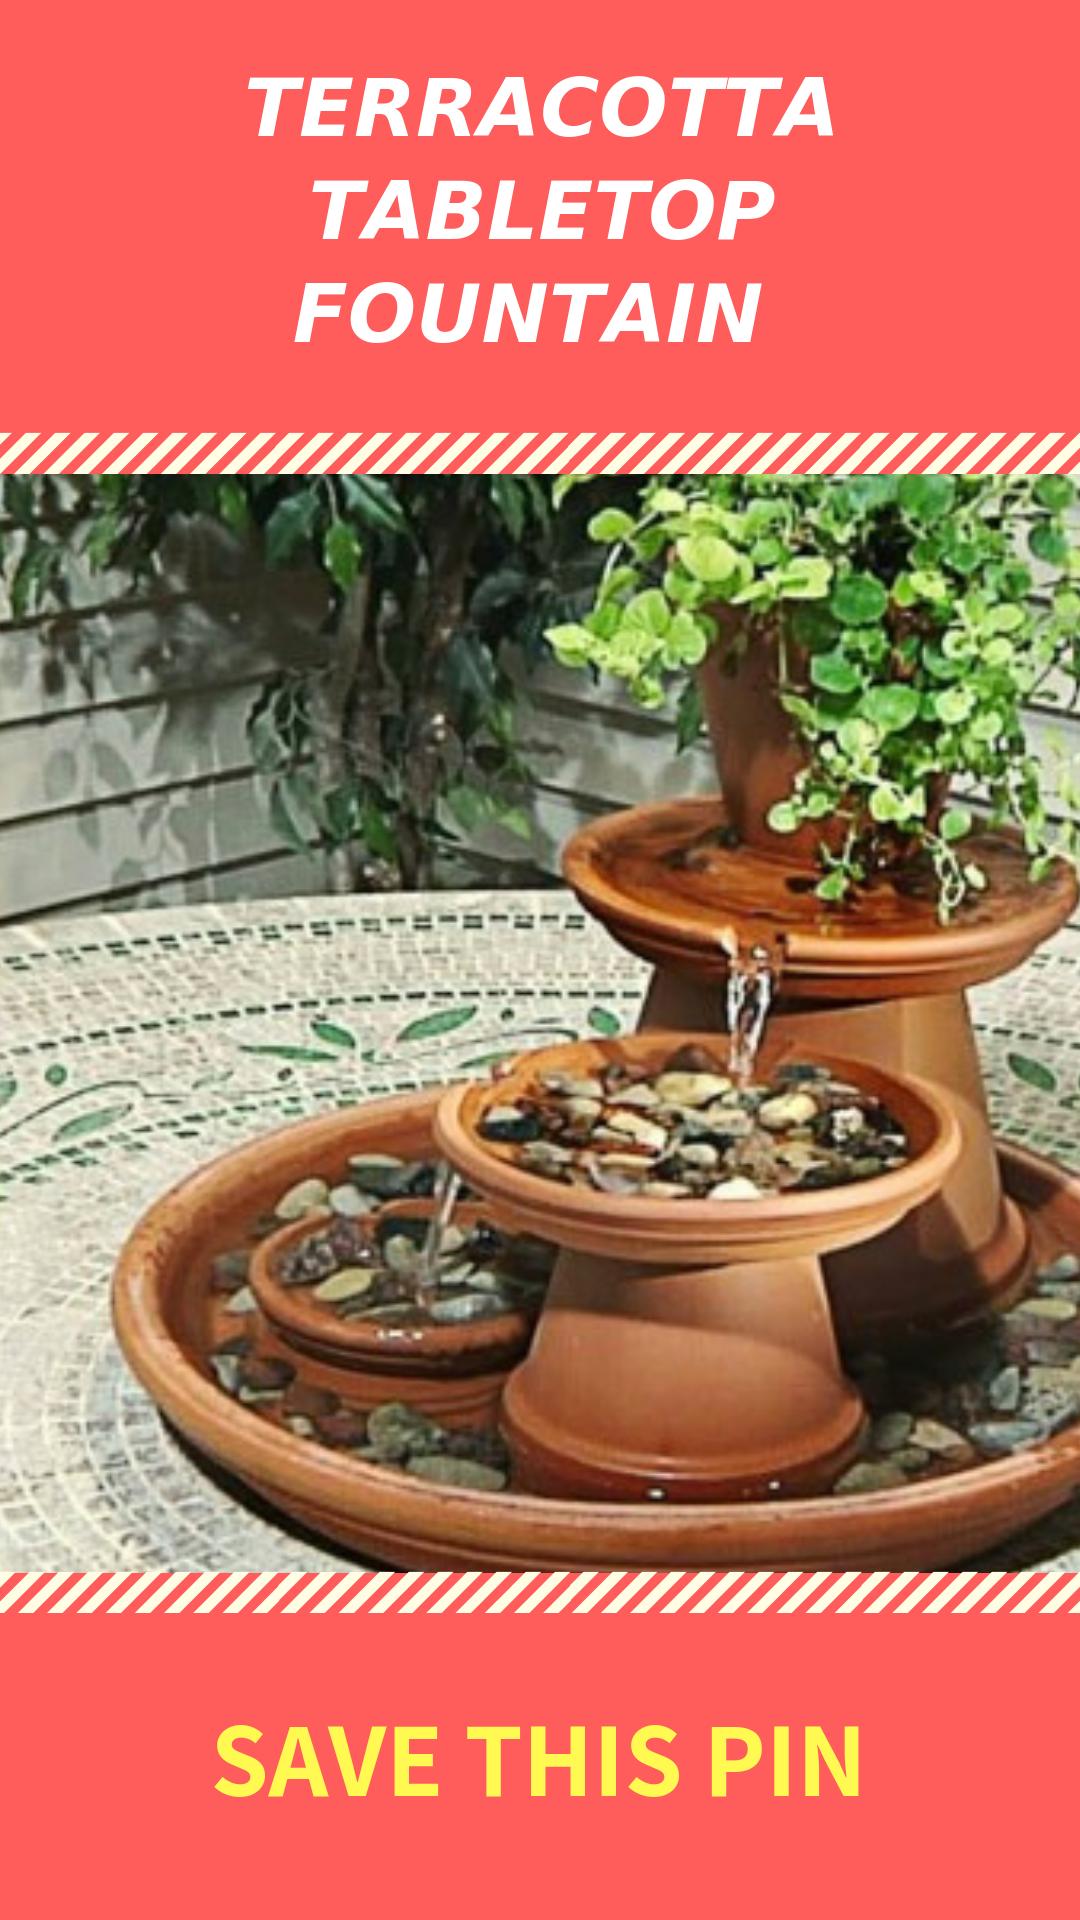 Diy Terracotta Tabletop Fountain Project For Outdoors Garden